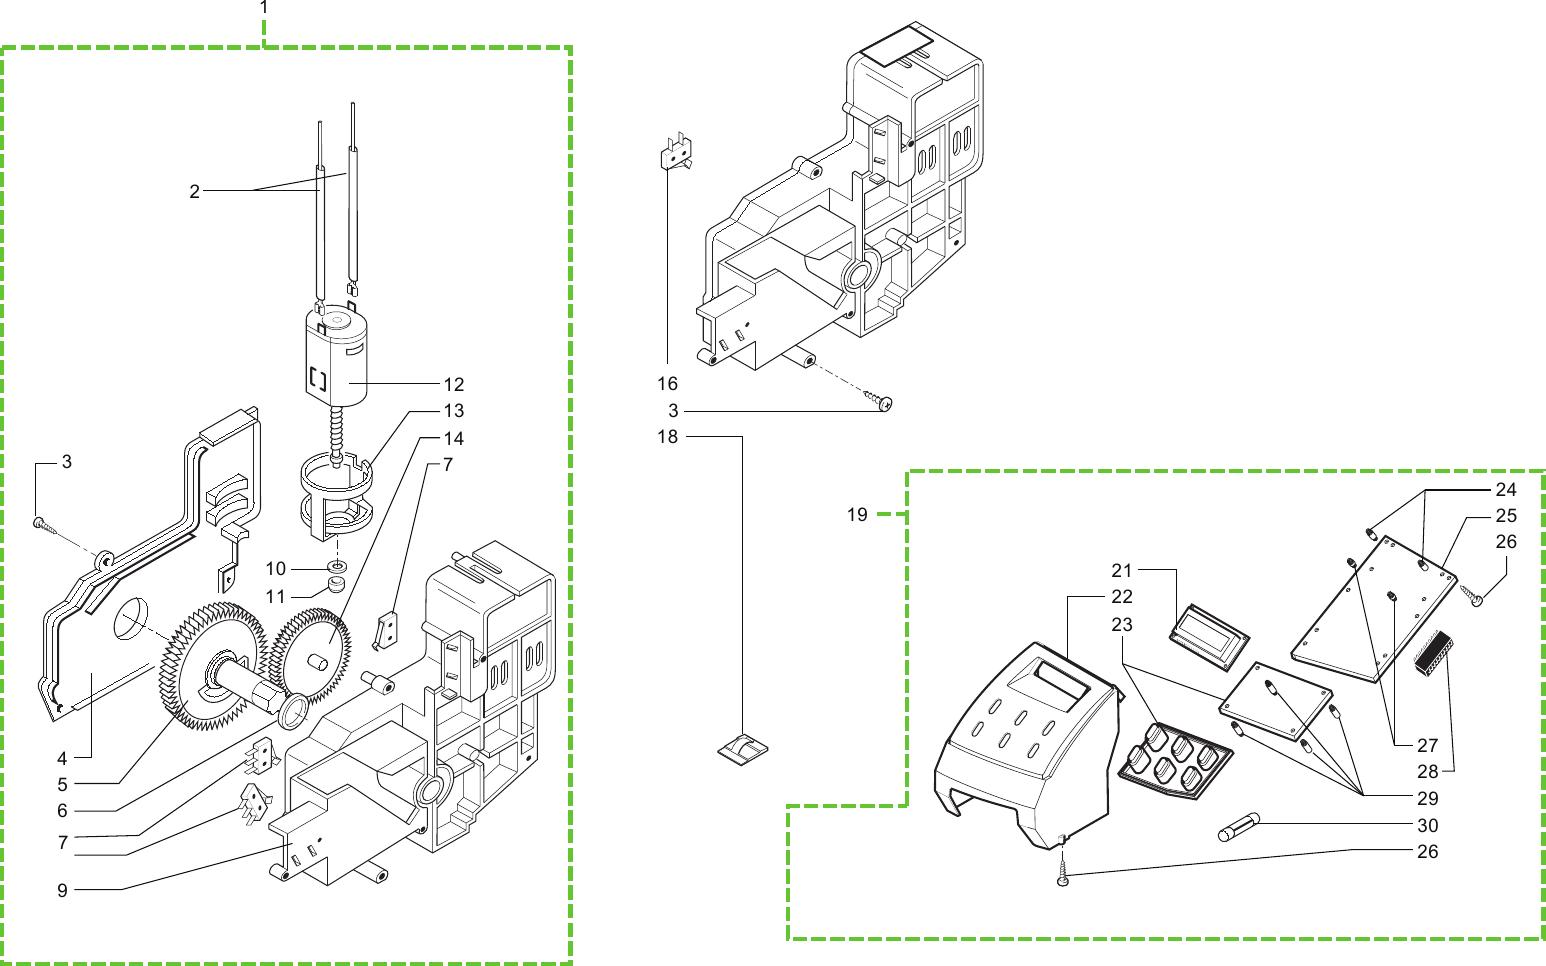 Gaggia Syncrony Digital Parts Diagram 01 E003.038_ed°3